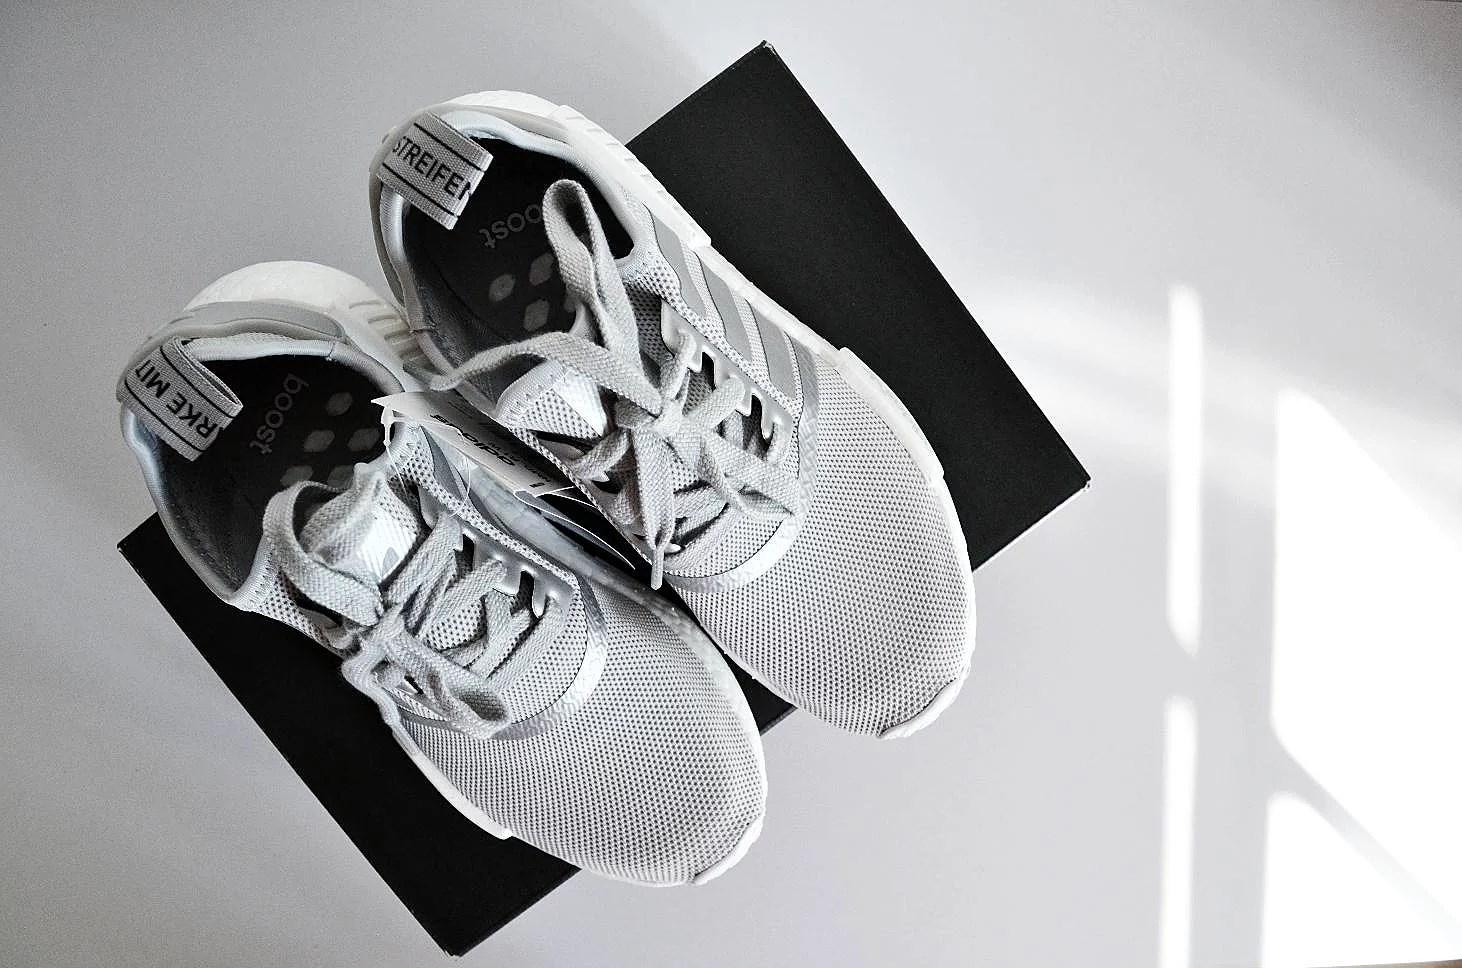 217: adidas nmd matte silver   Joanna D. Hansson